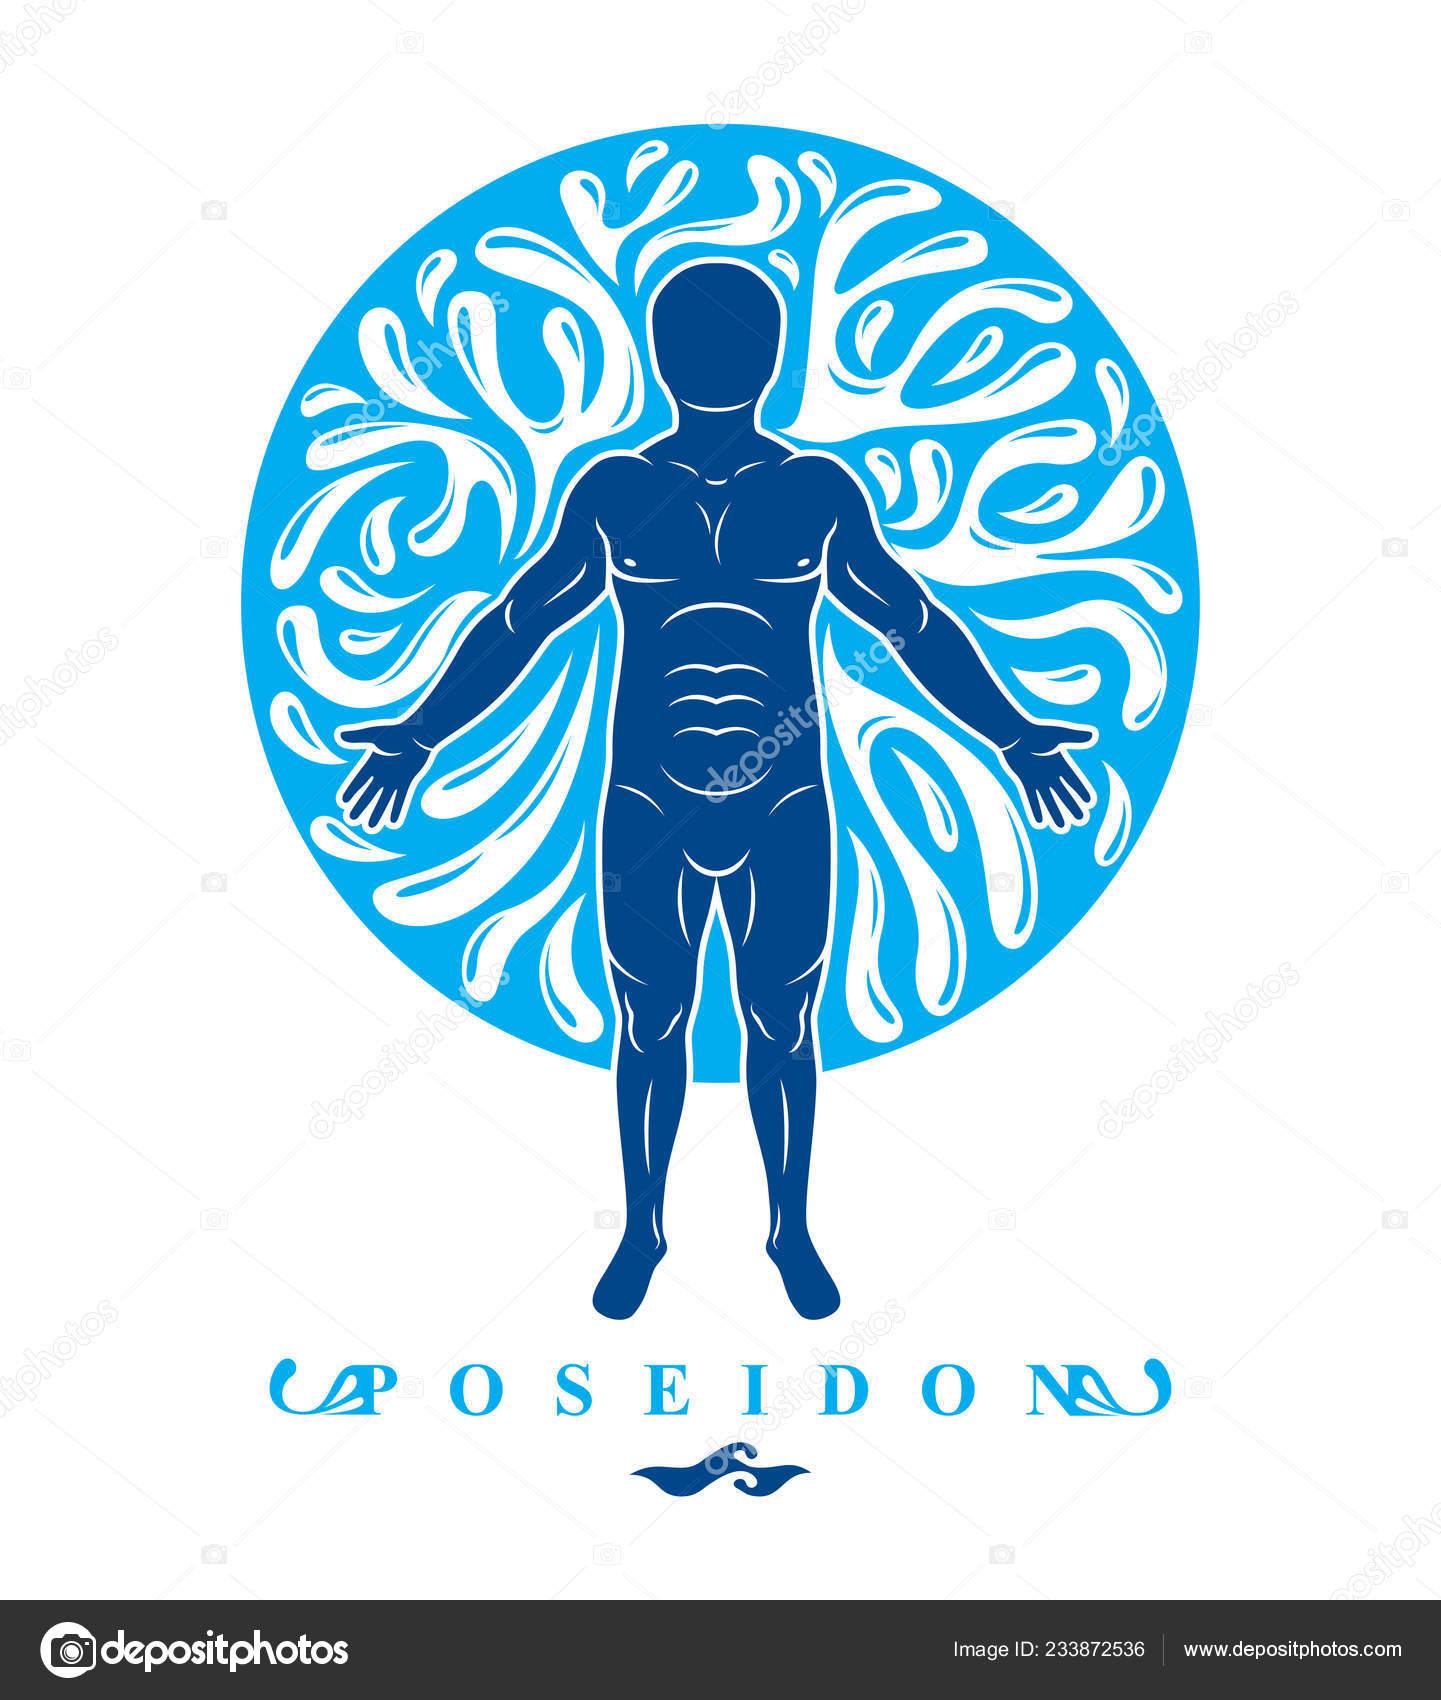 Vector Illustration Human Athlete Poseidon God Sea Defender